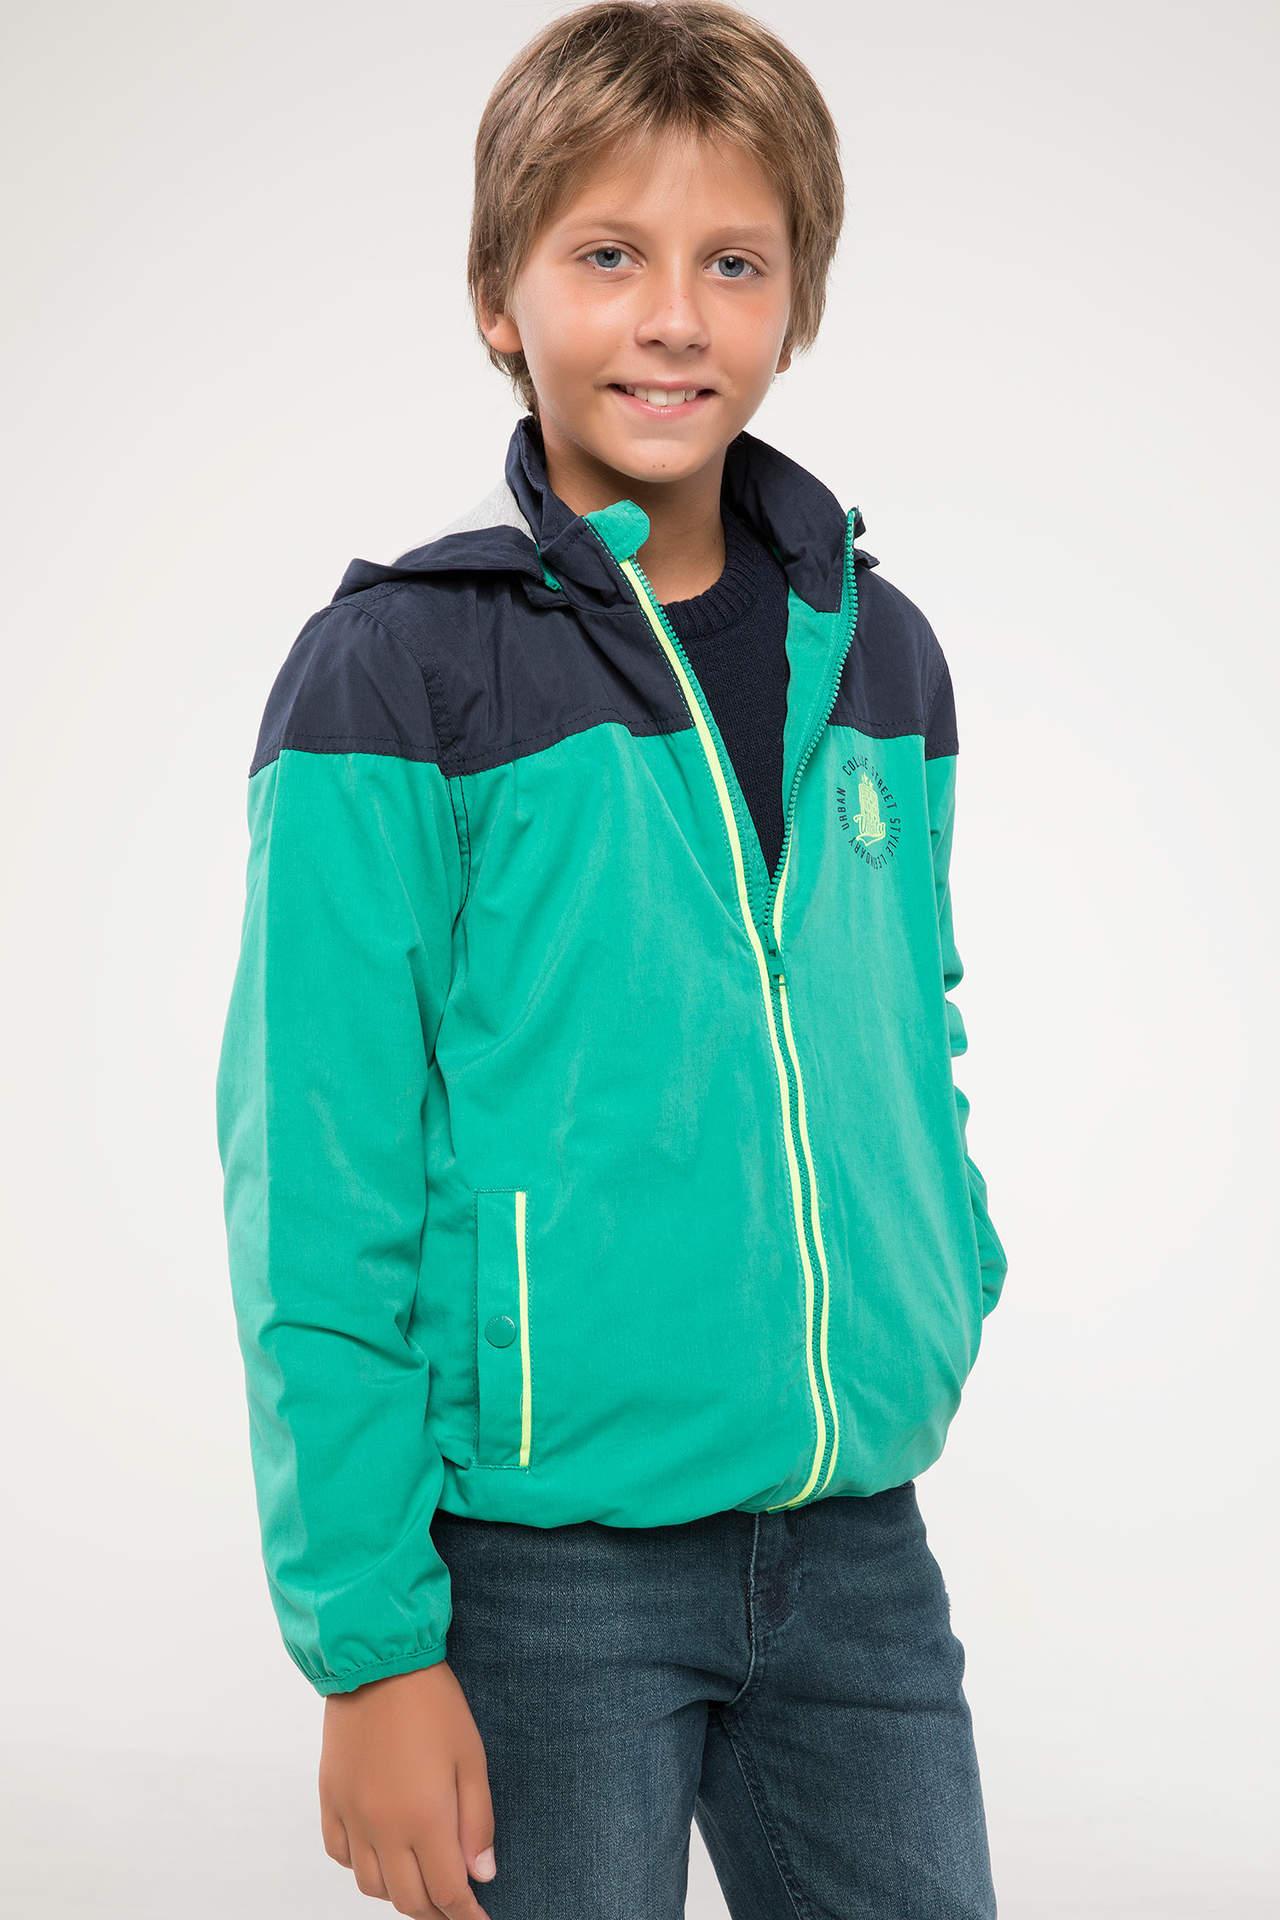 DeFacto Erkek Çocuk Kapüşonlu Mont Yeşil male